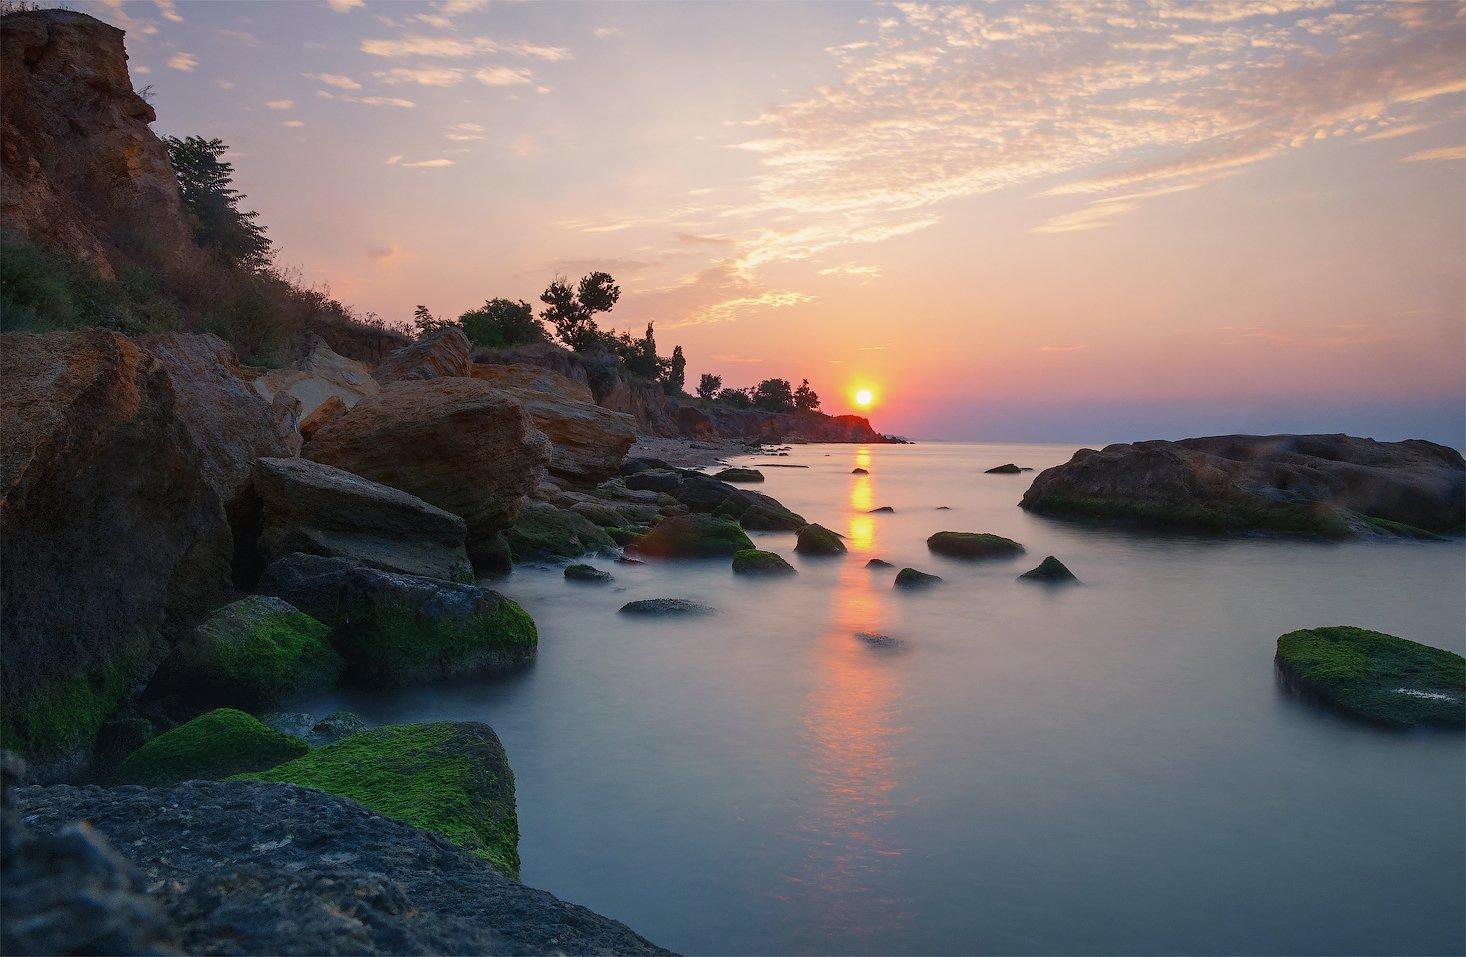 одесса, фонтанка, украина, восход, солнца, камни, море, вода, туман, облака, Андрей Кобыща